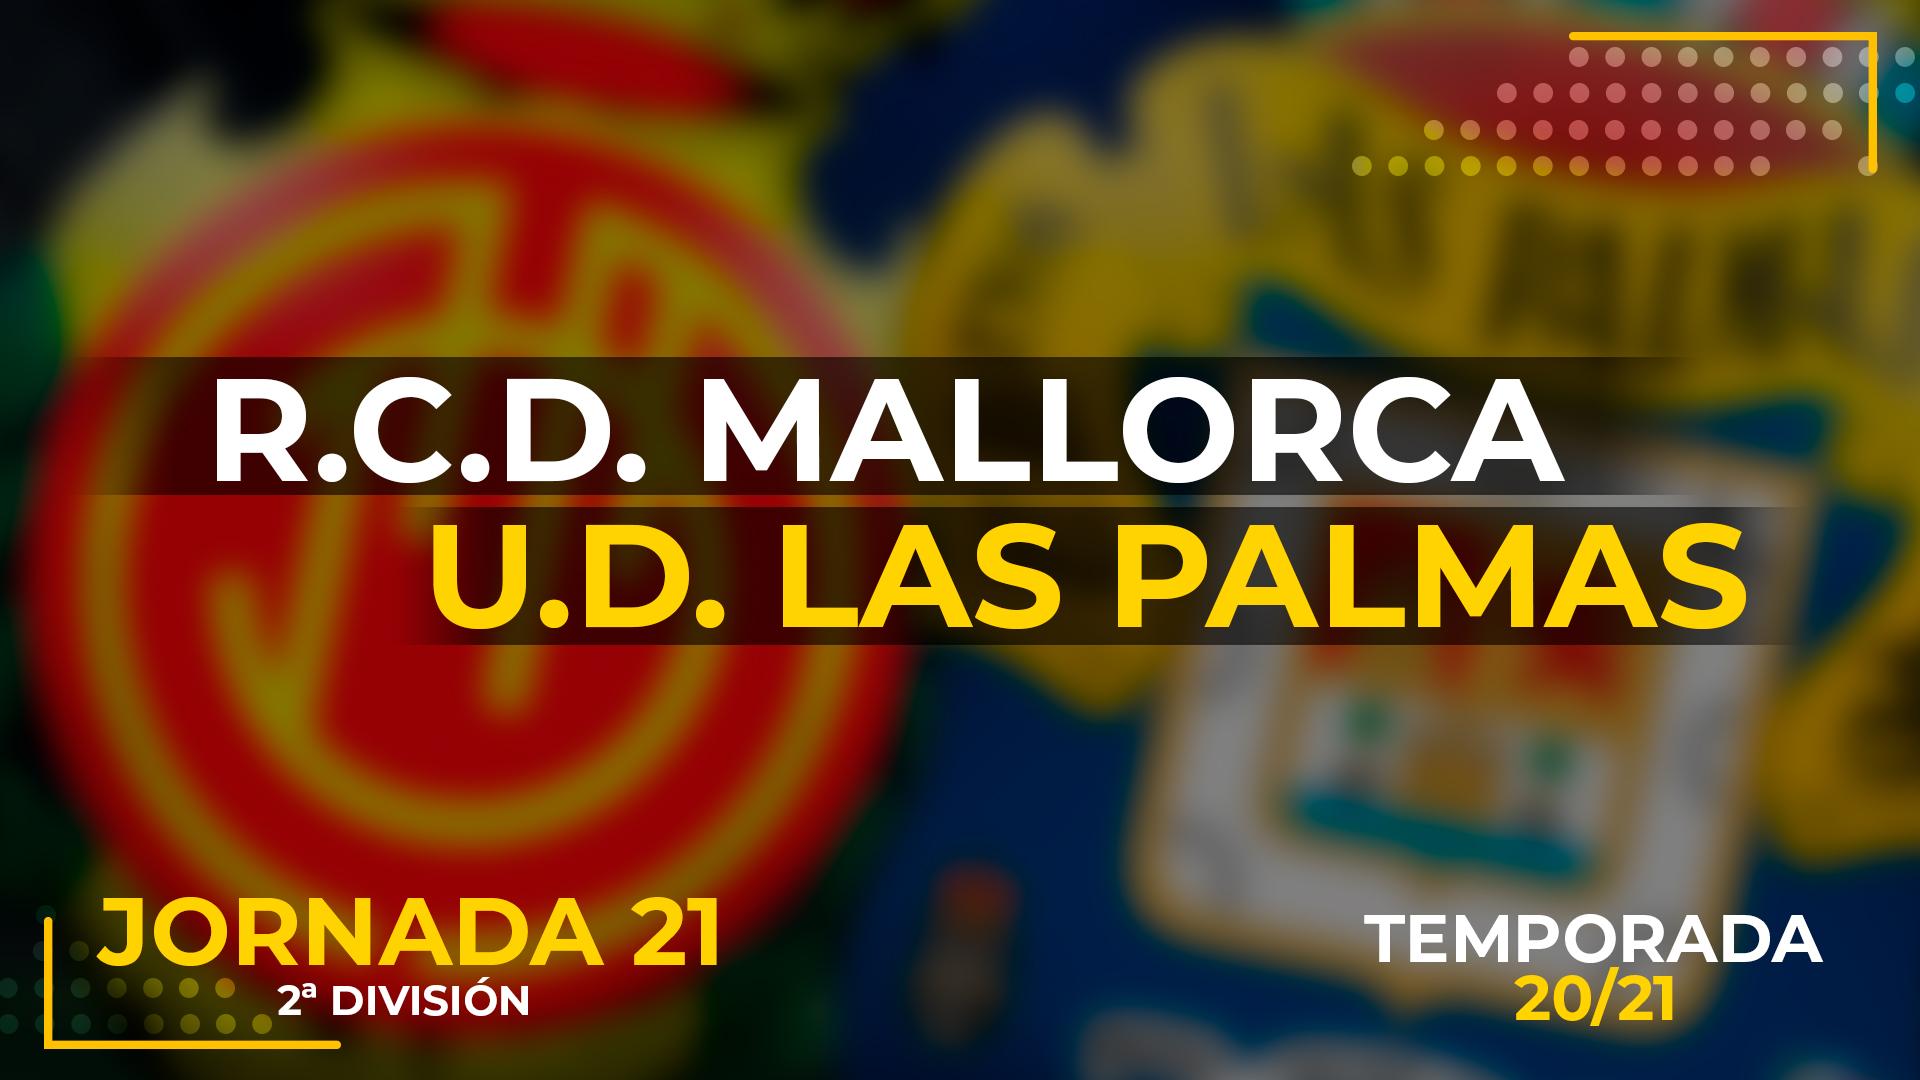 Mallorca vs UD Las Palmas